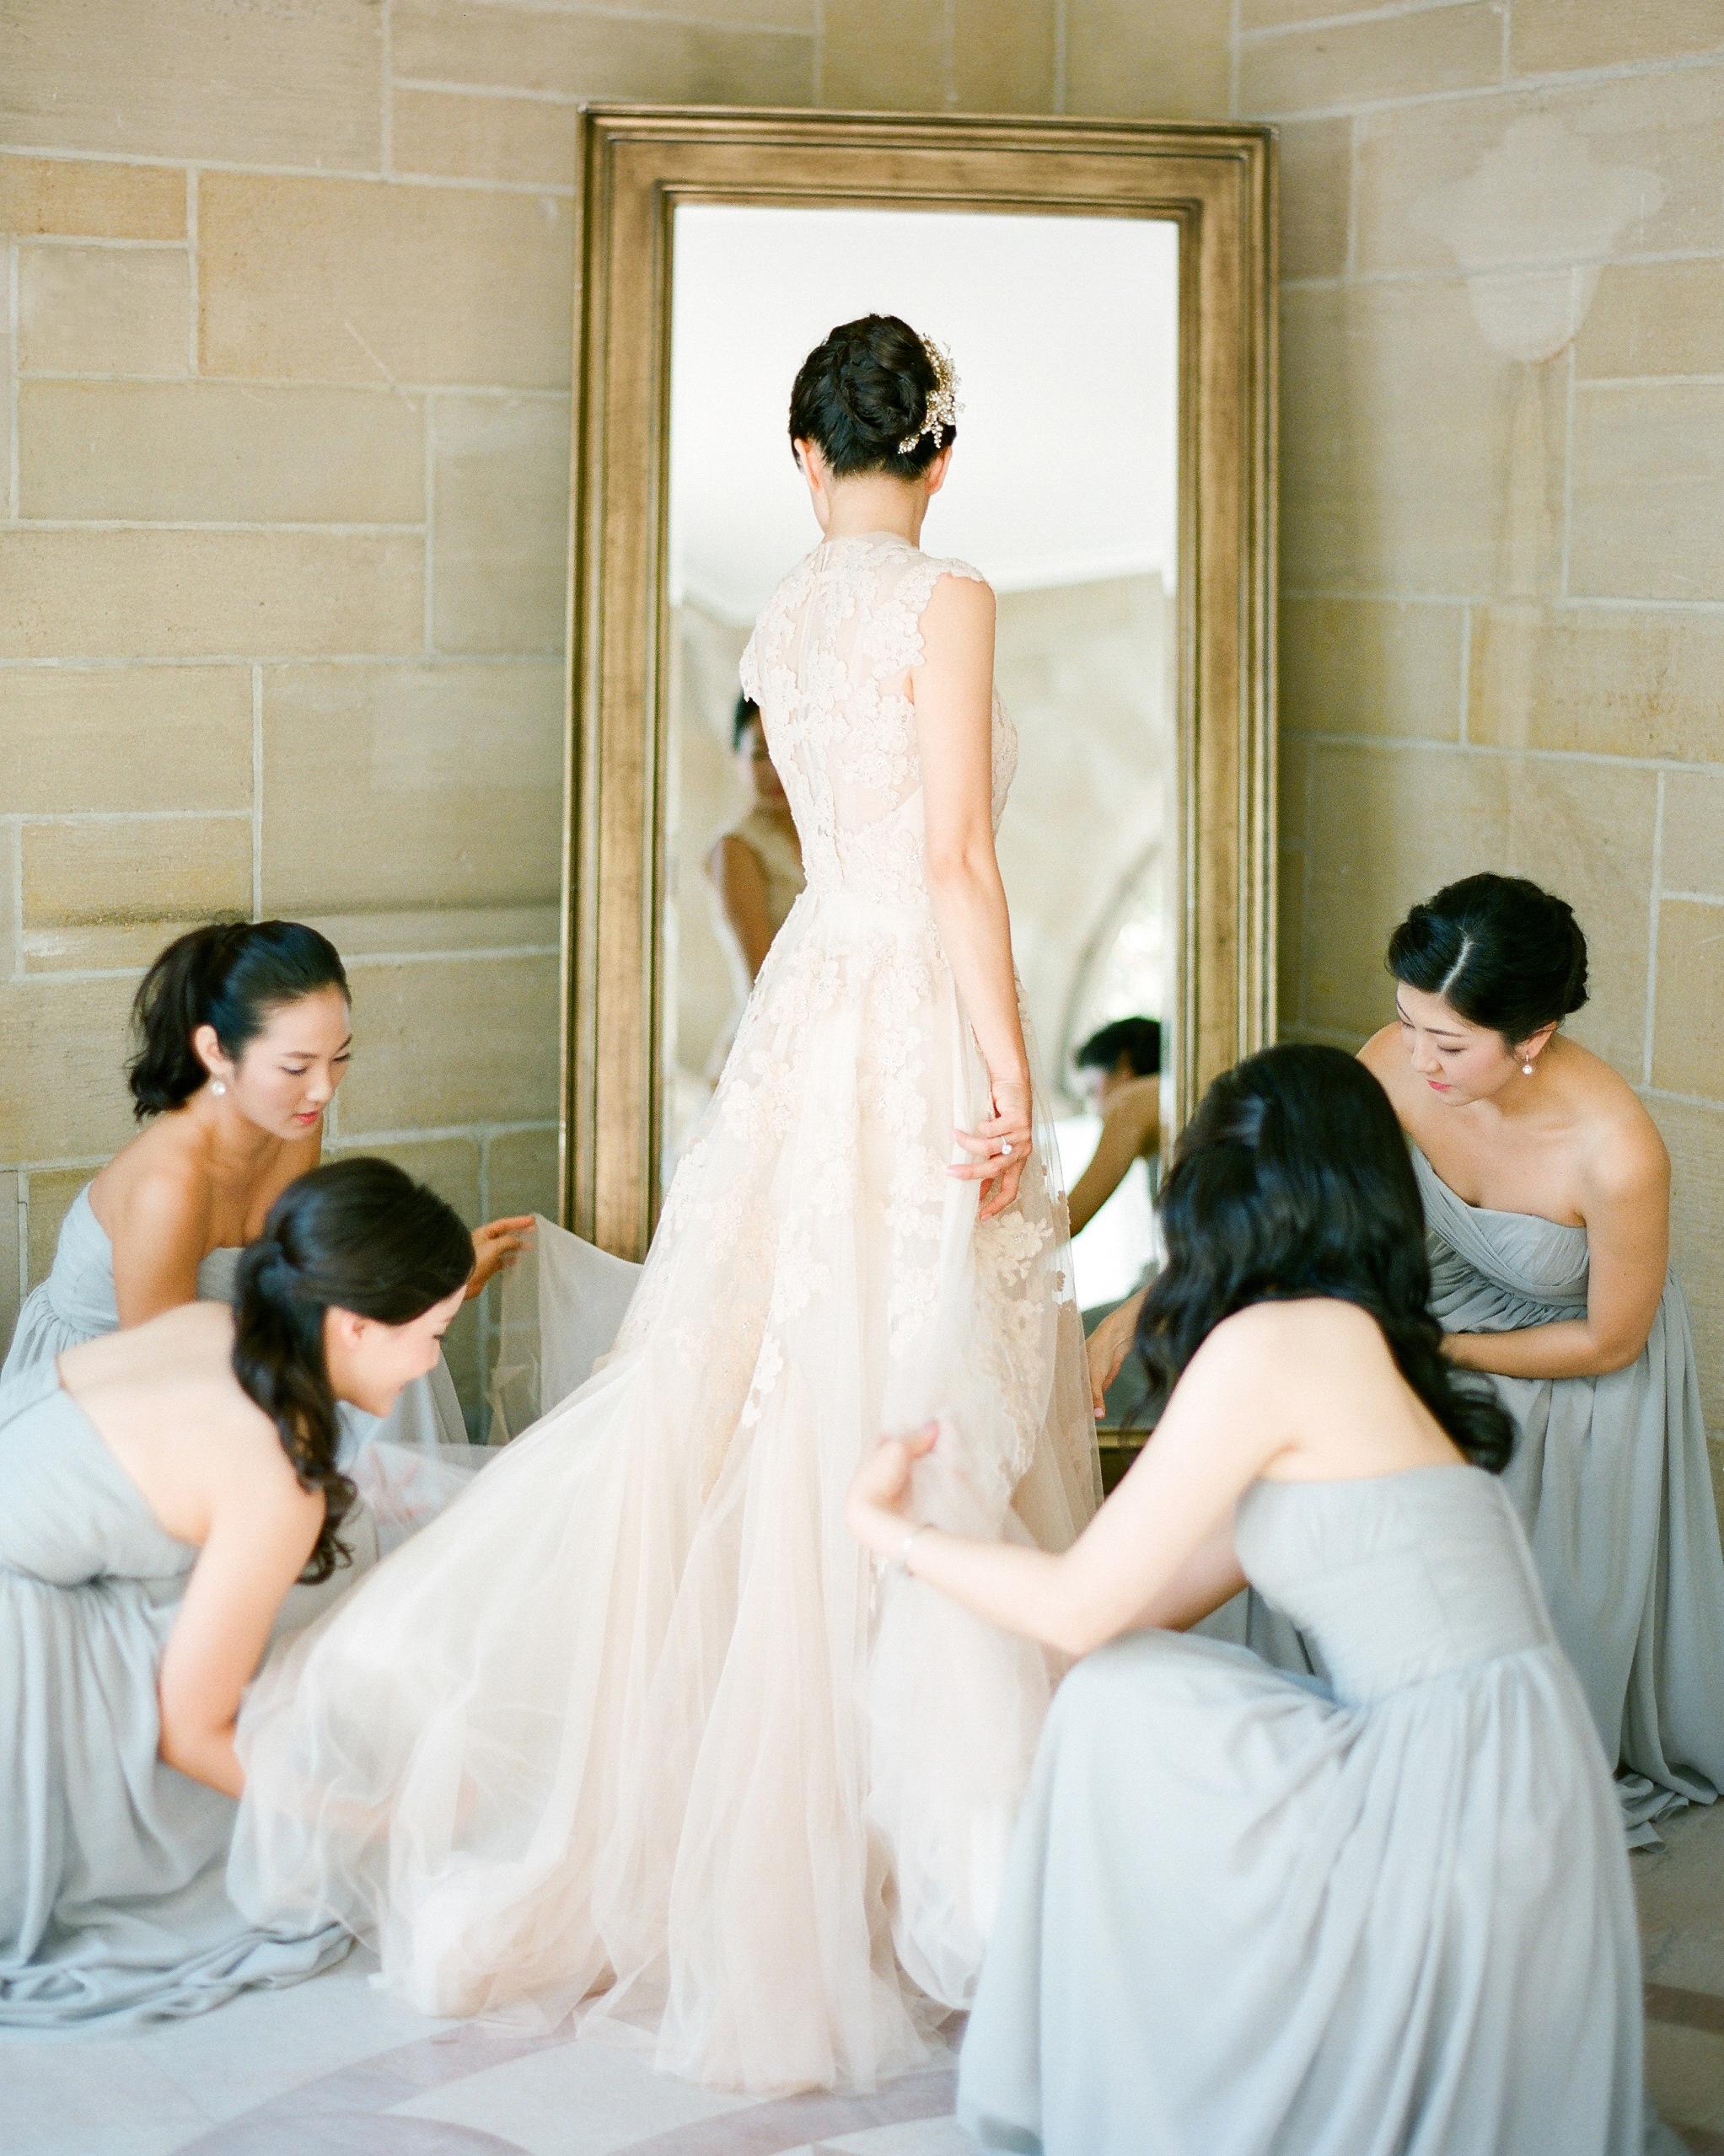 annie-tad-wedding-0050-s111160.jpg